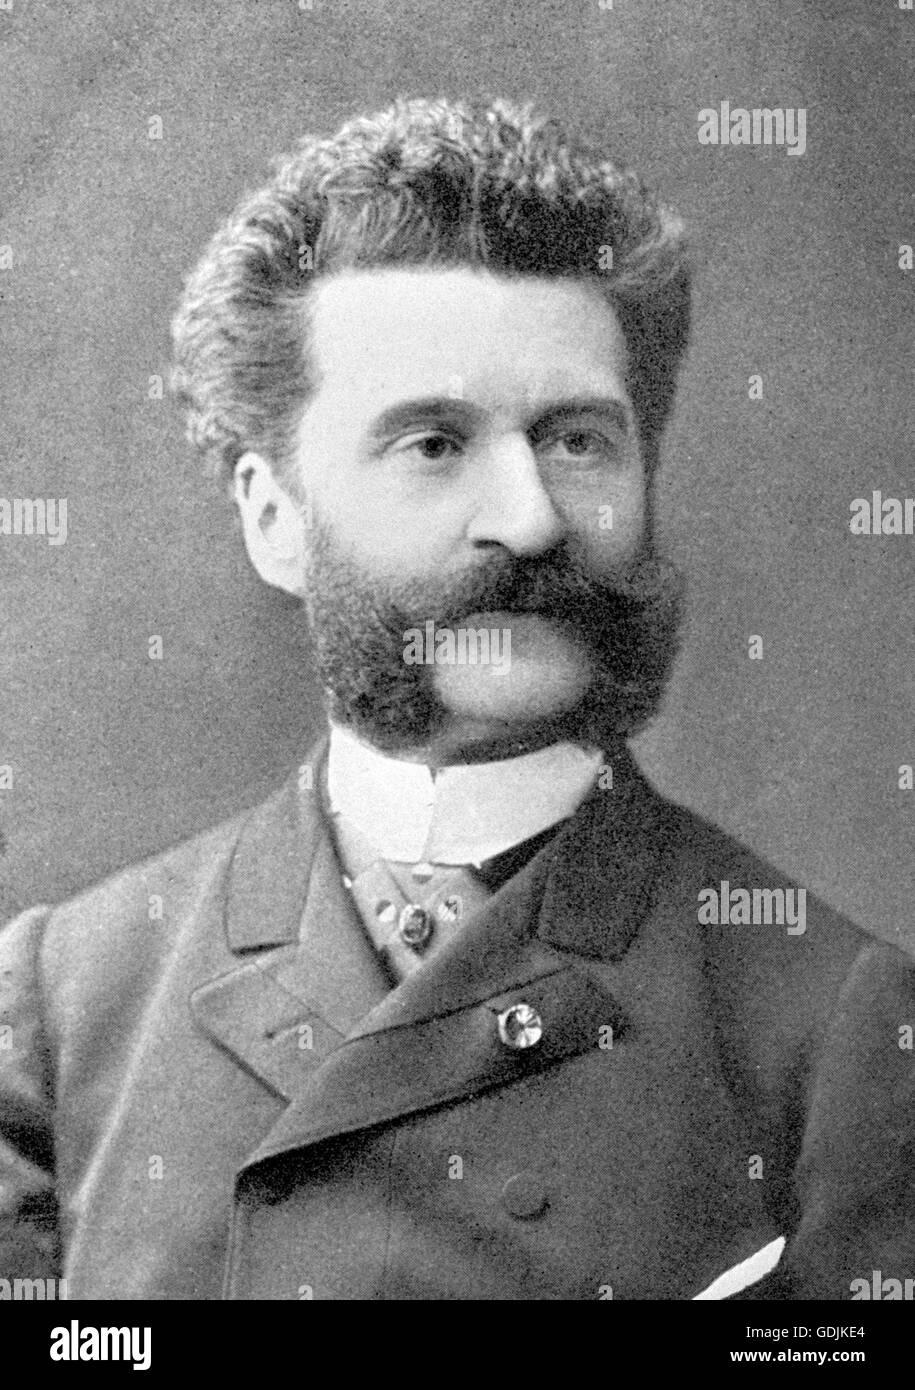 The Austrian composer, Johann Strauss II (1825-1899) - Stock Image